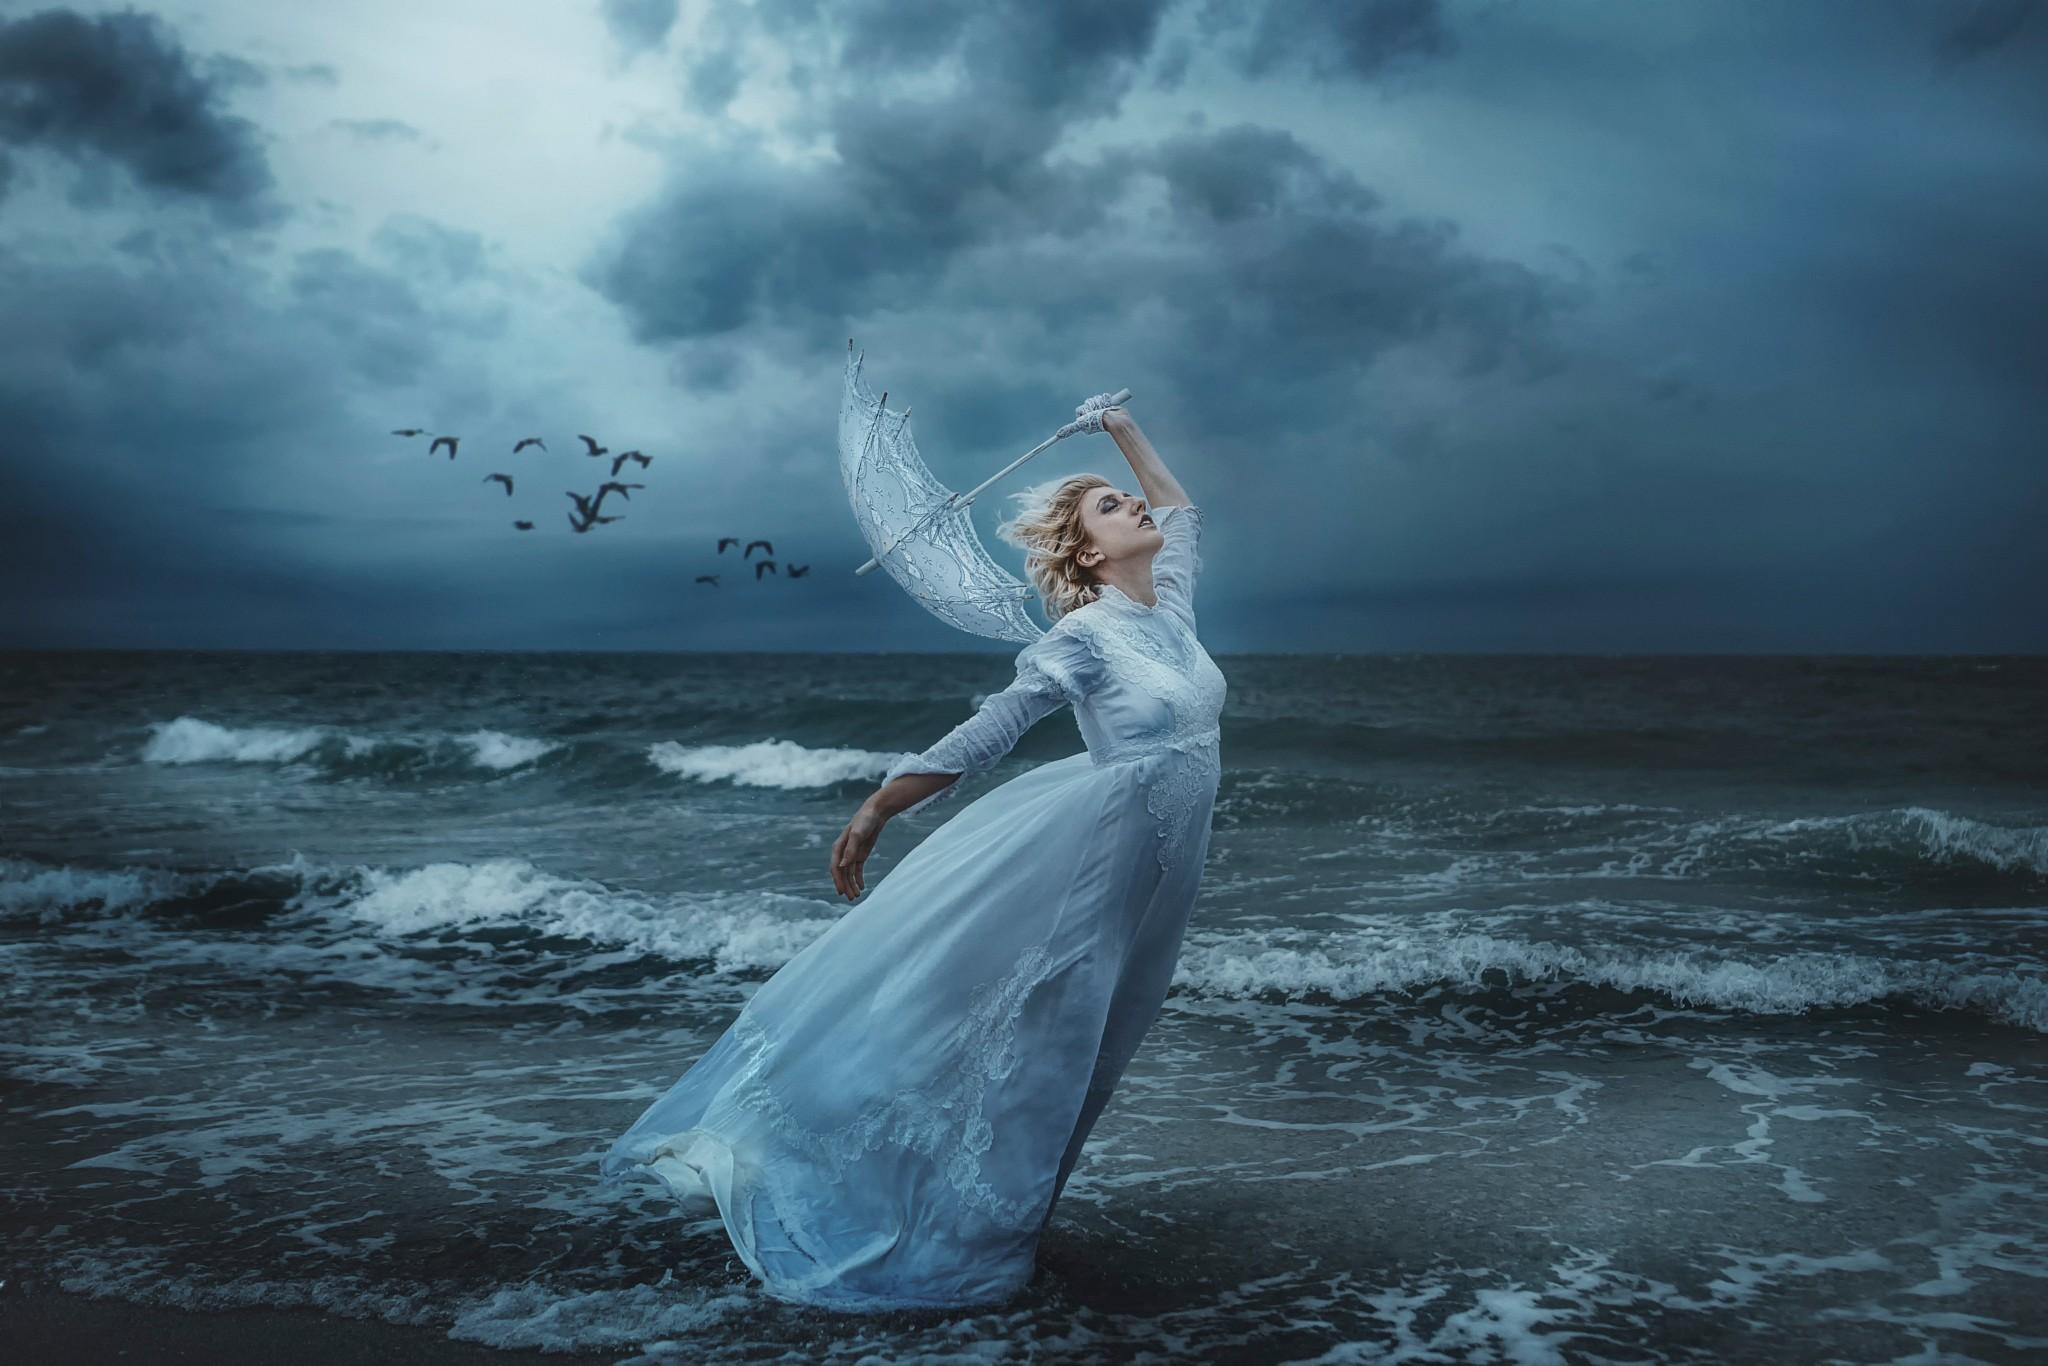 Wallpaper Umbrella Upside Down Floating Hd Creative: Wallpaper : Women, Model, Fantasy Art, Sea, Underwater